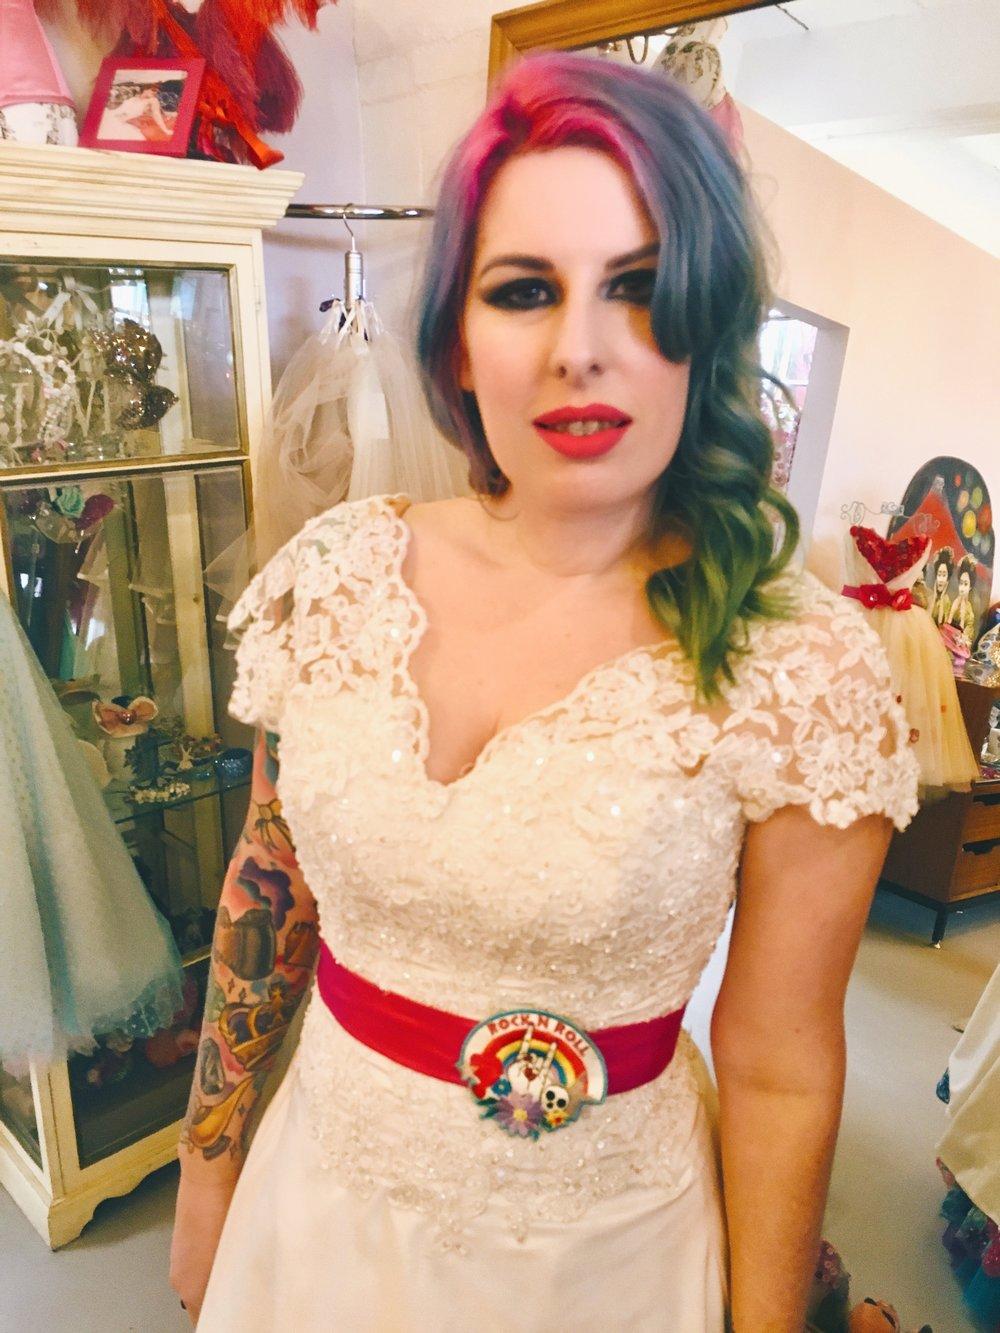 Lovely Kat from @rocknrollbride Check out her amazing magazine!     https://www.rocknrollbride.com